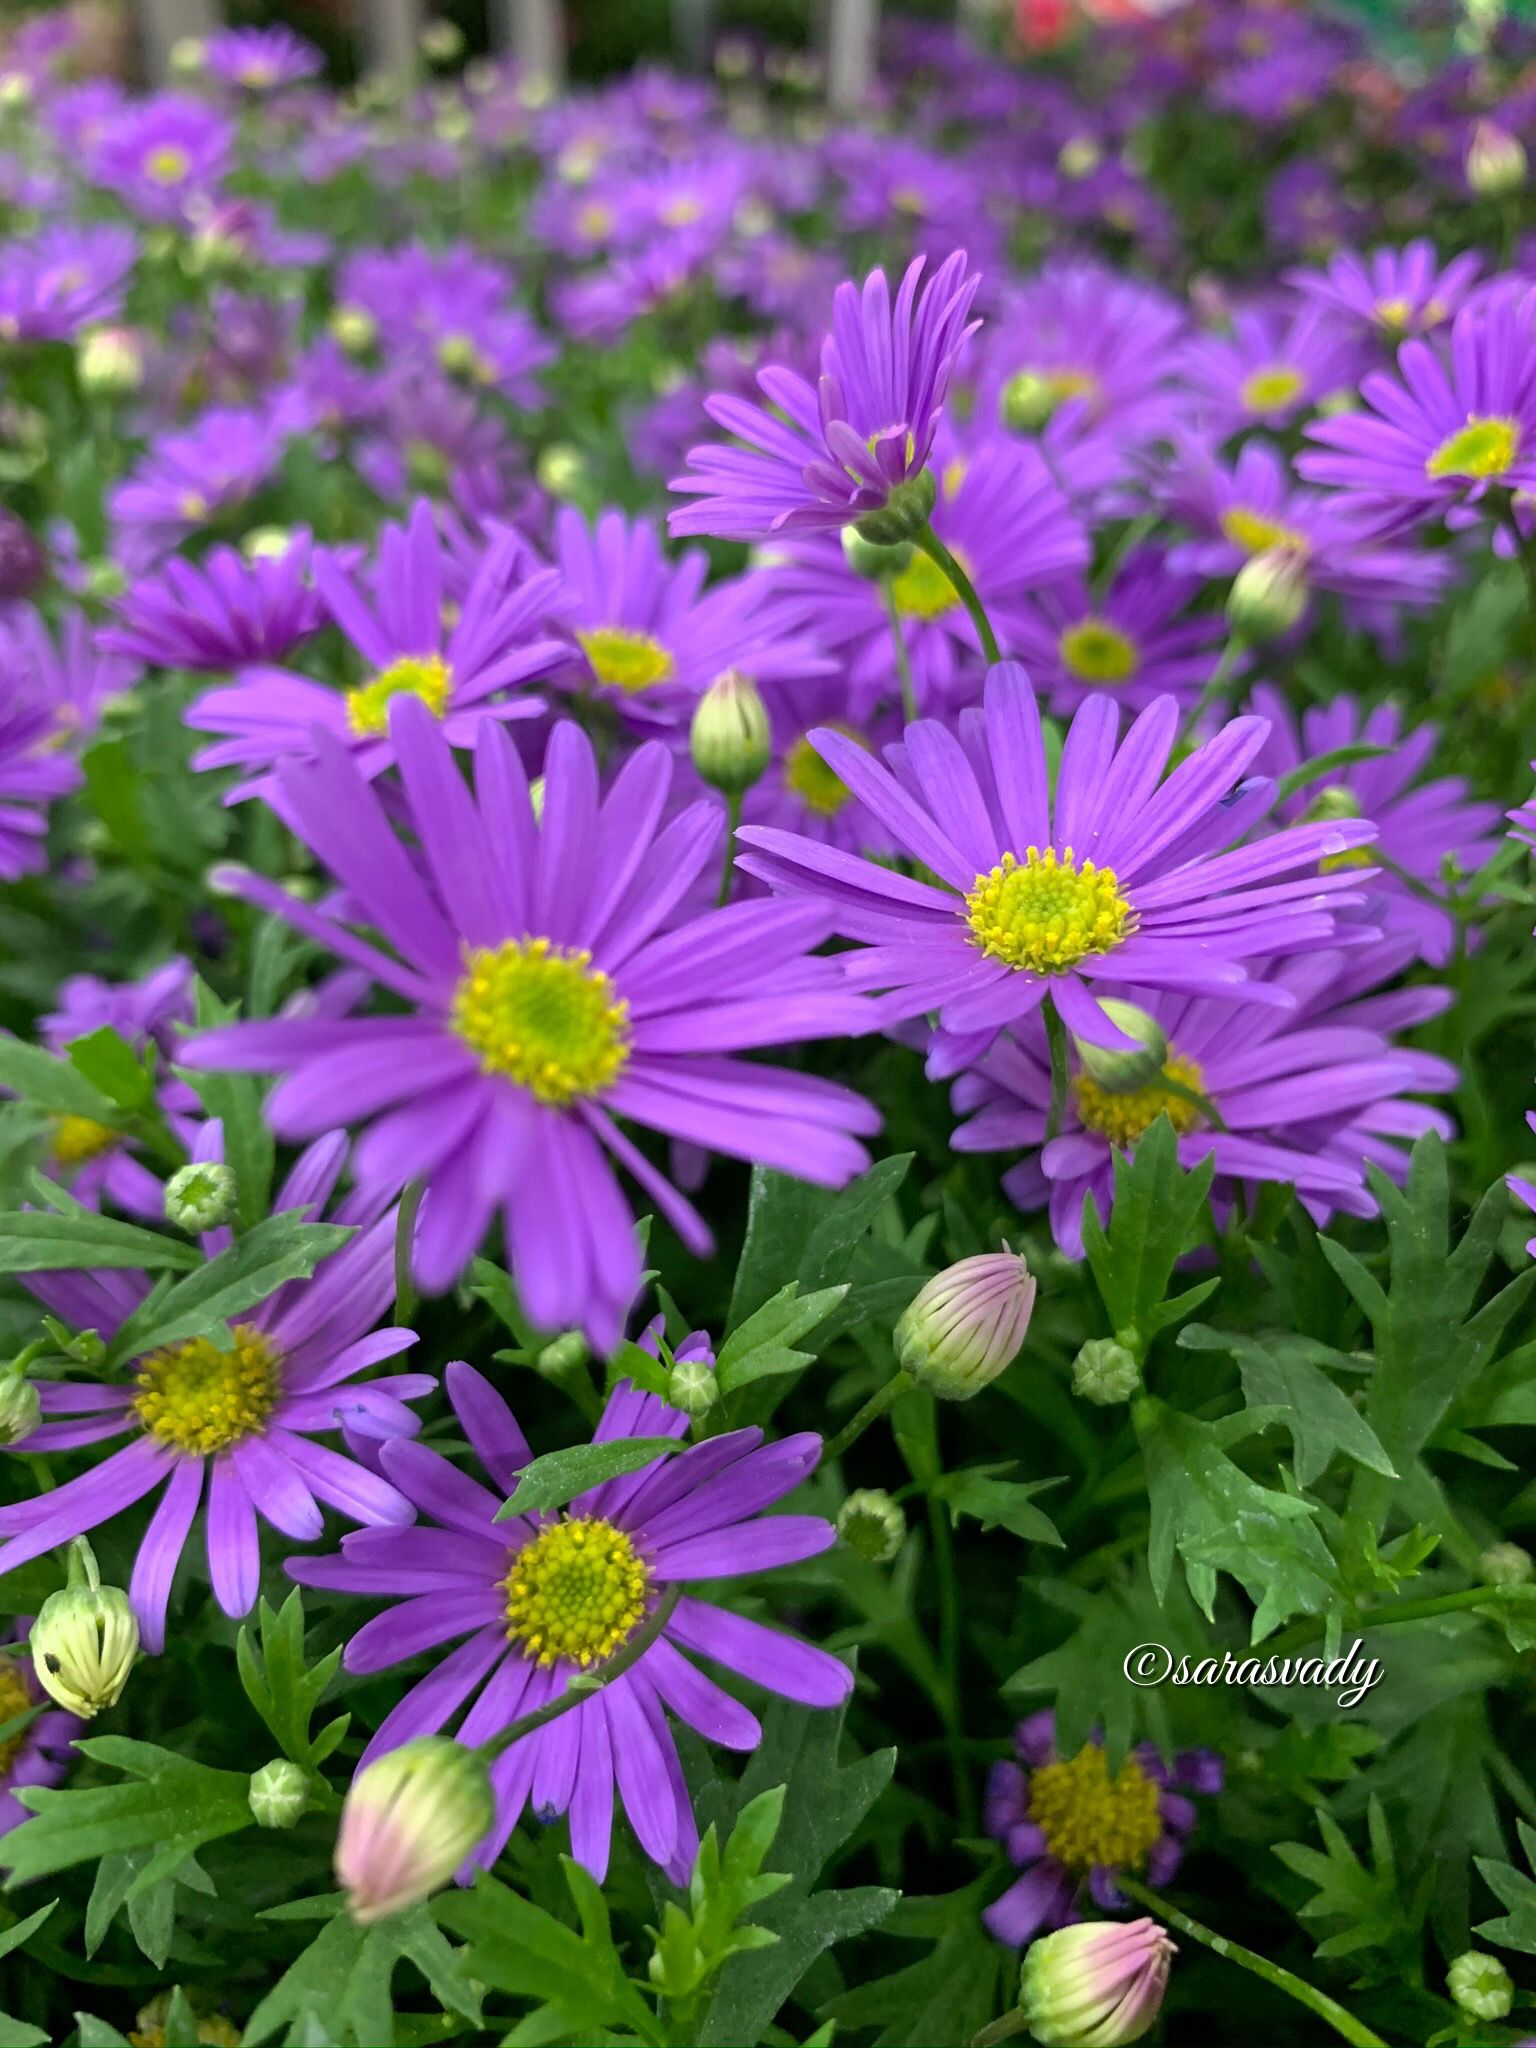 Pin By Sarasvady Rattinavelou On Violet Flowers In 2020 Violet Flower Planting Flowers Pretty Flowers